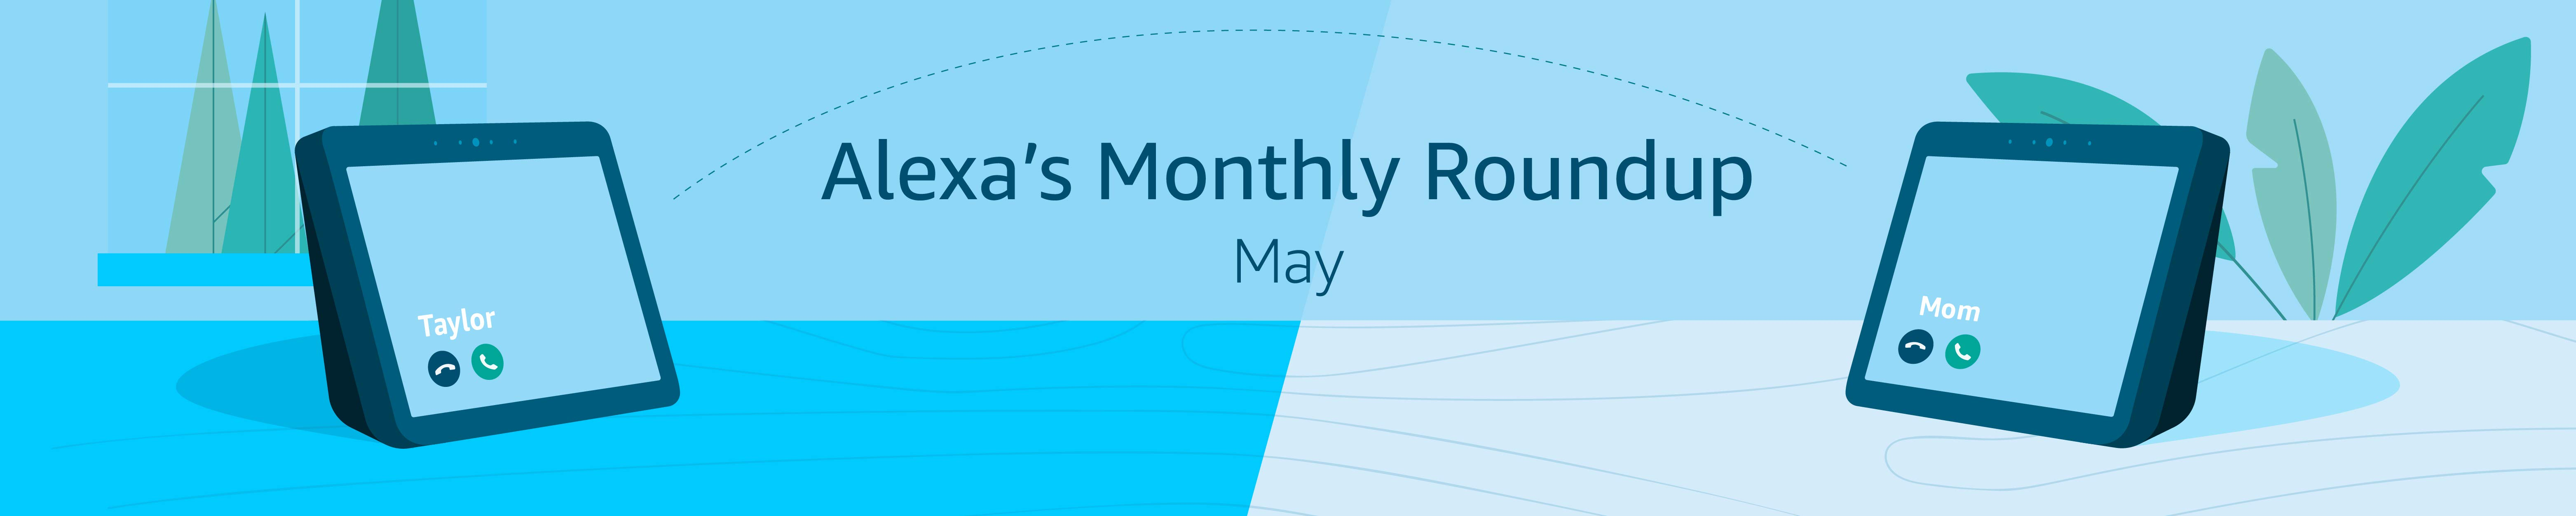 Alexa's monthly roundup: May